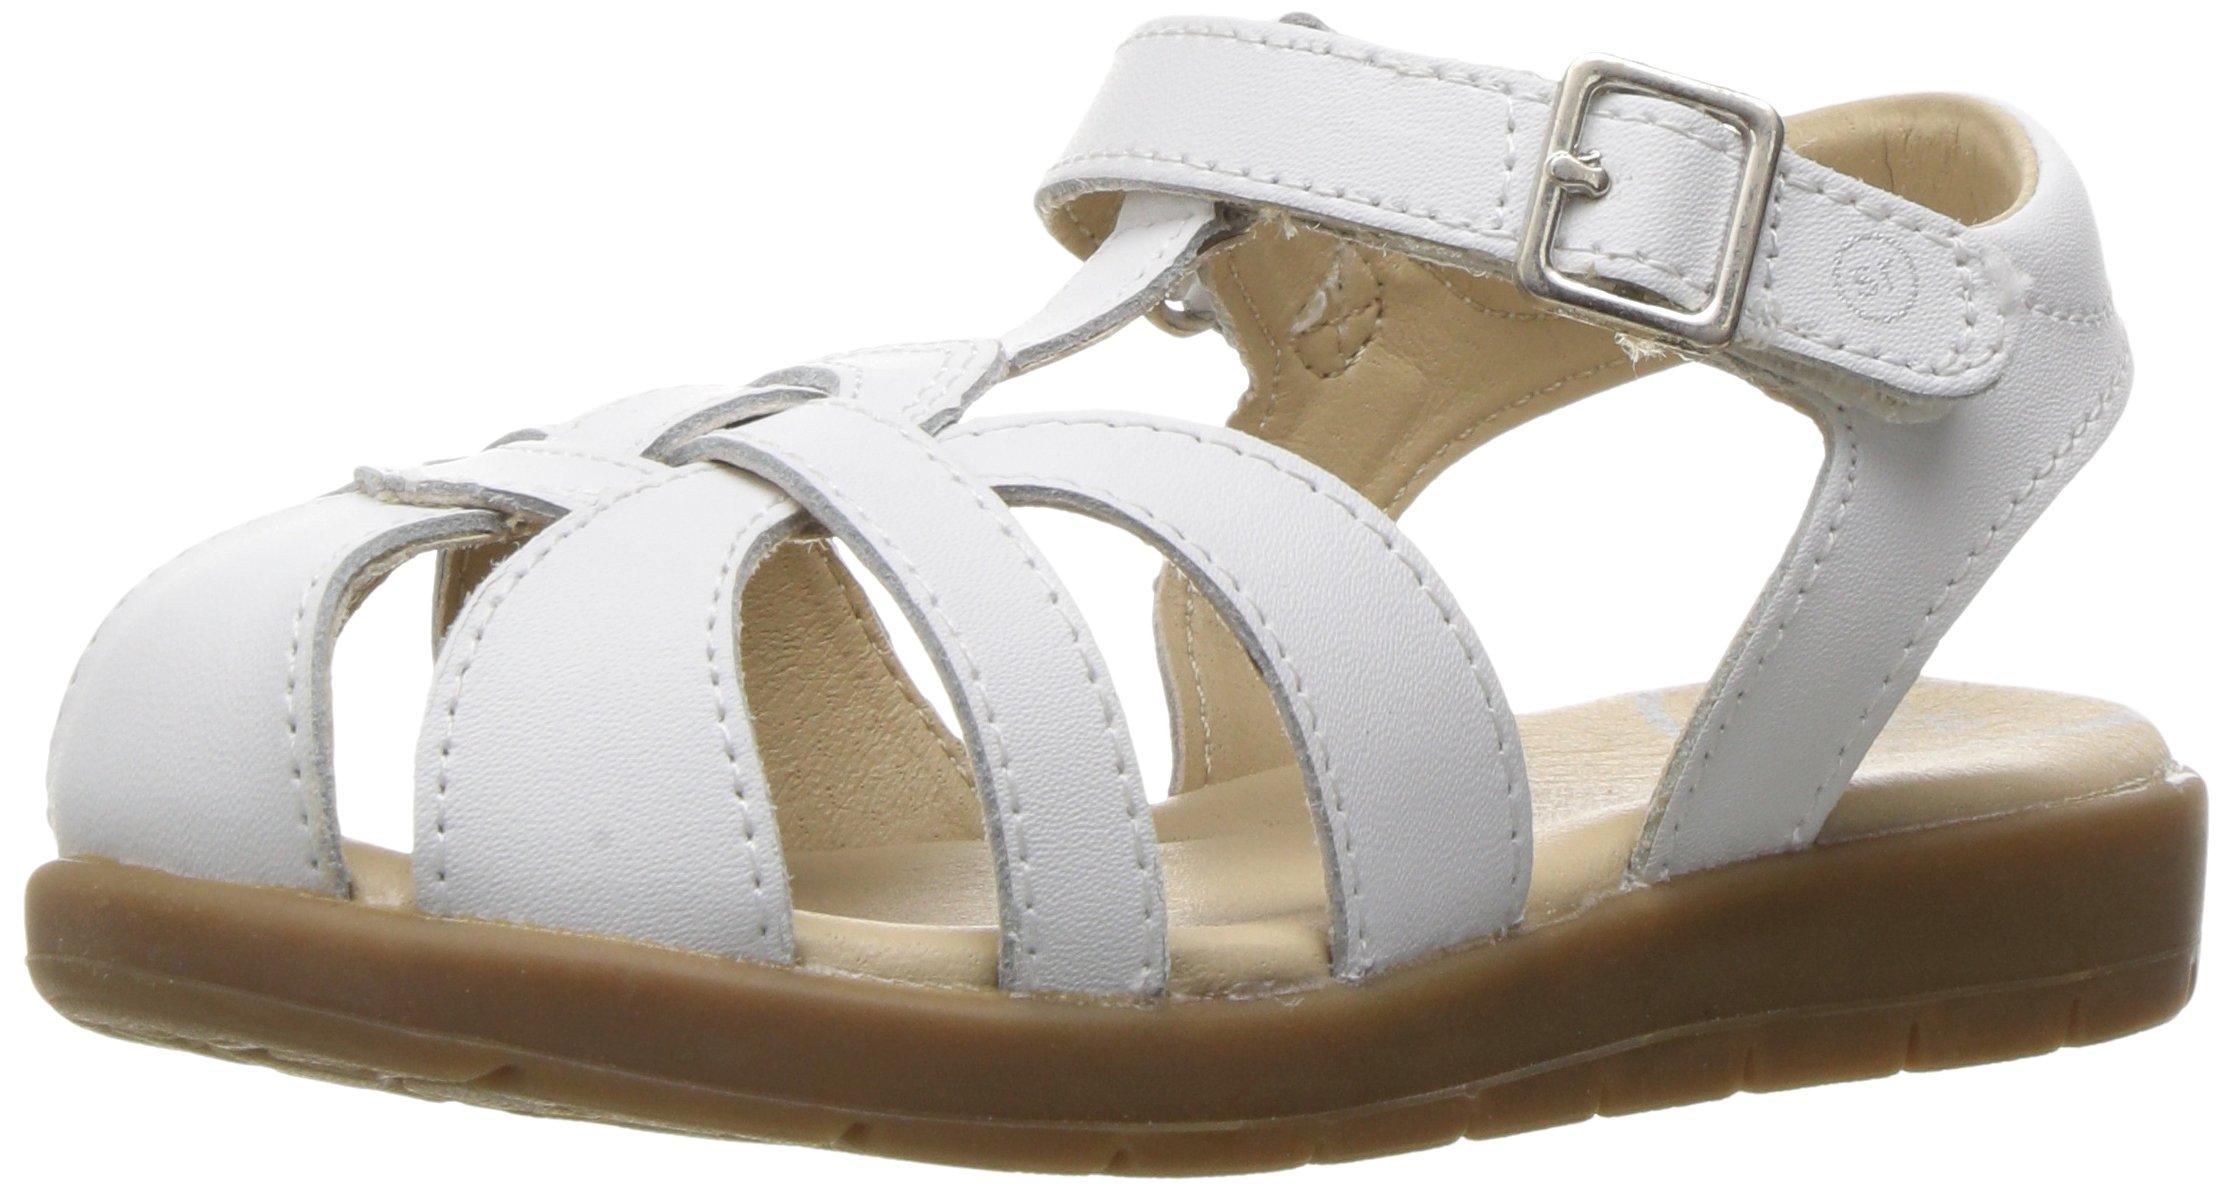 Stride Rite Summer Time Sandal (Toddler/Little Kid), White, 9 M US Toddler by Stride Rite